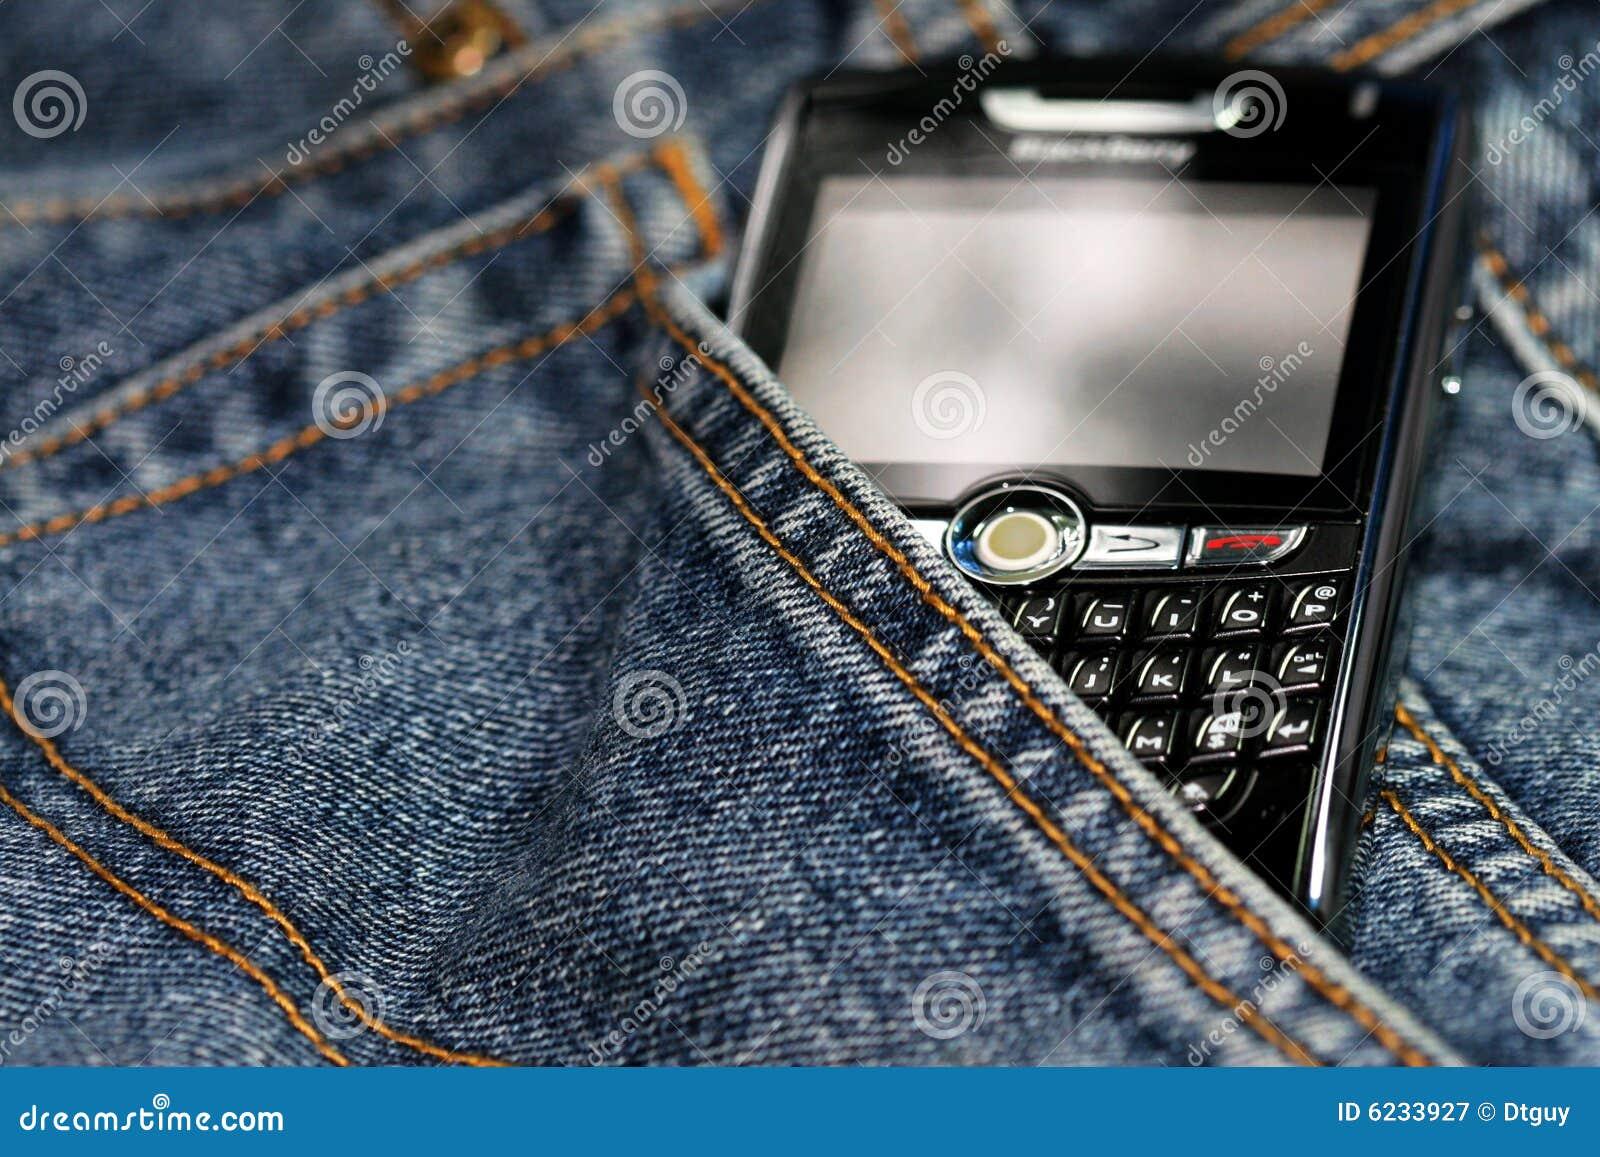 Blackberry cell phone 8820